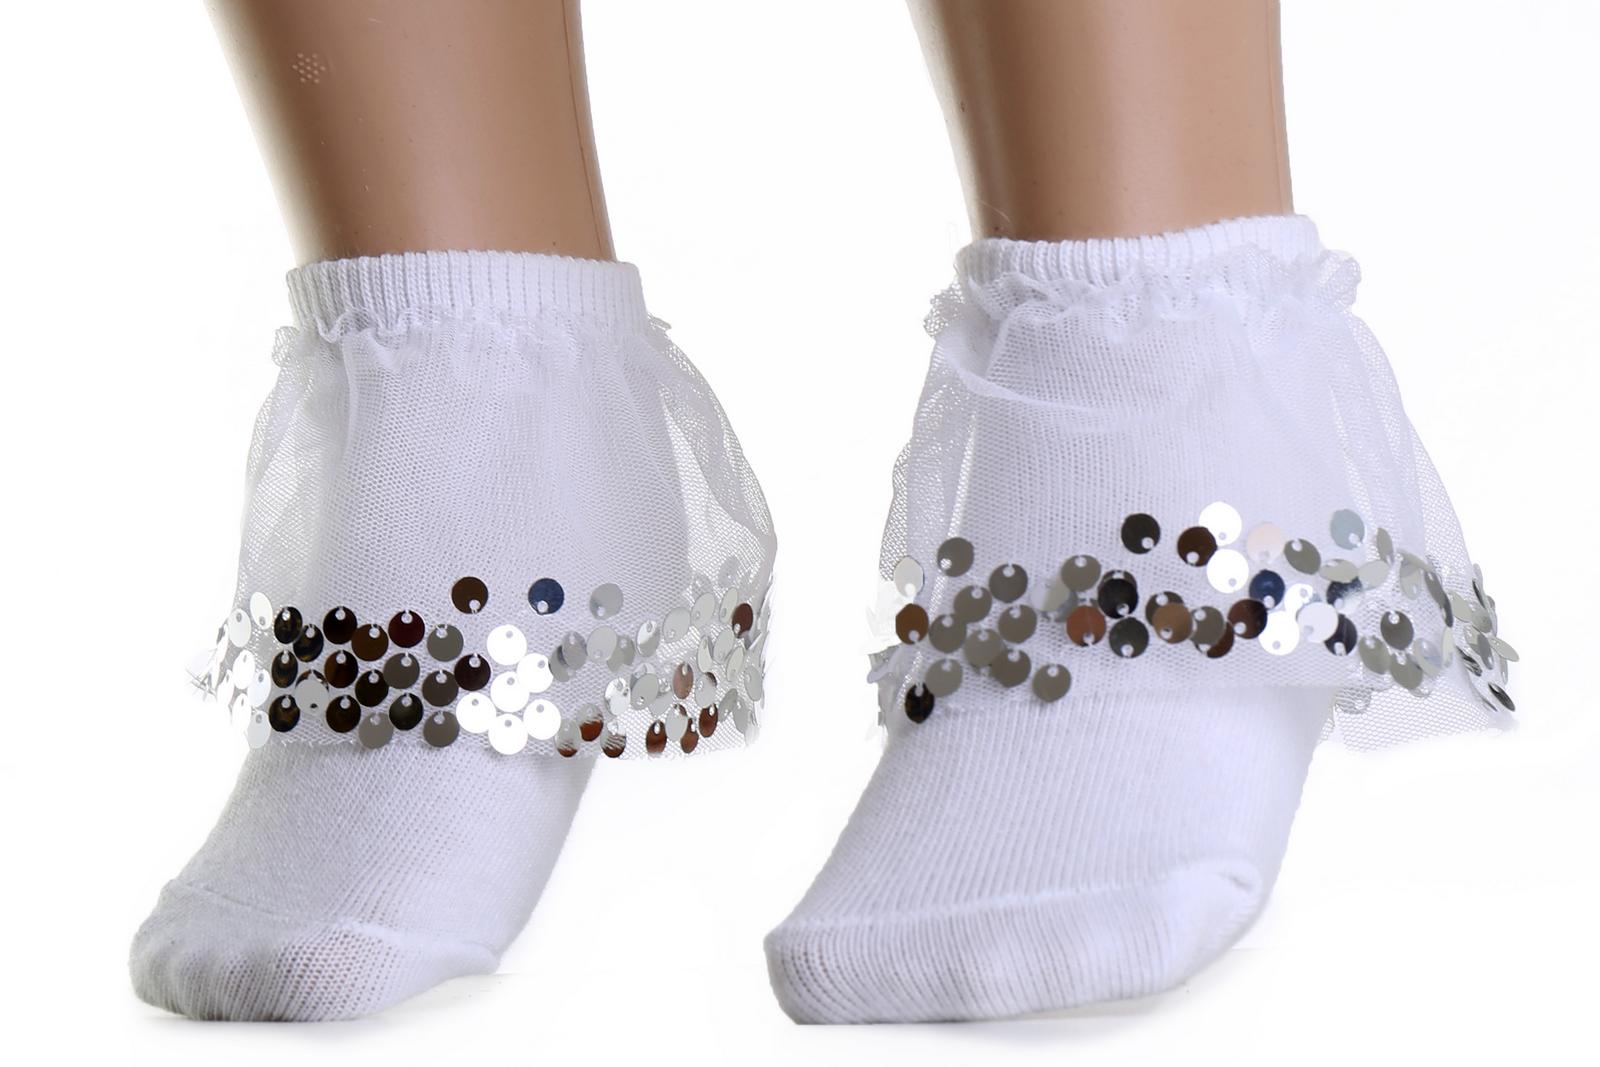 Socks photography (3)